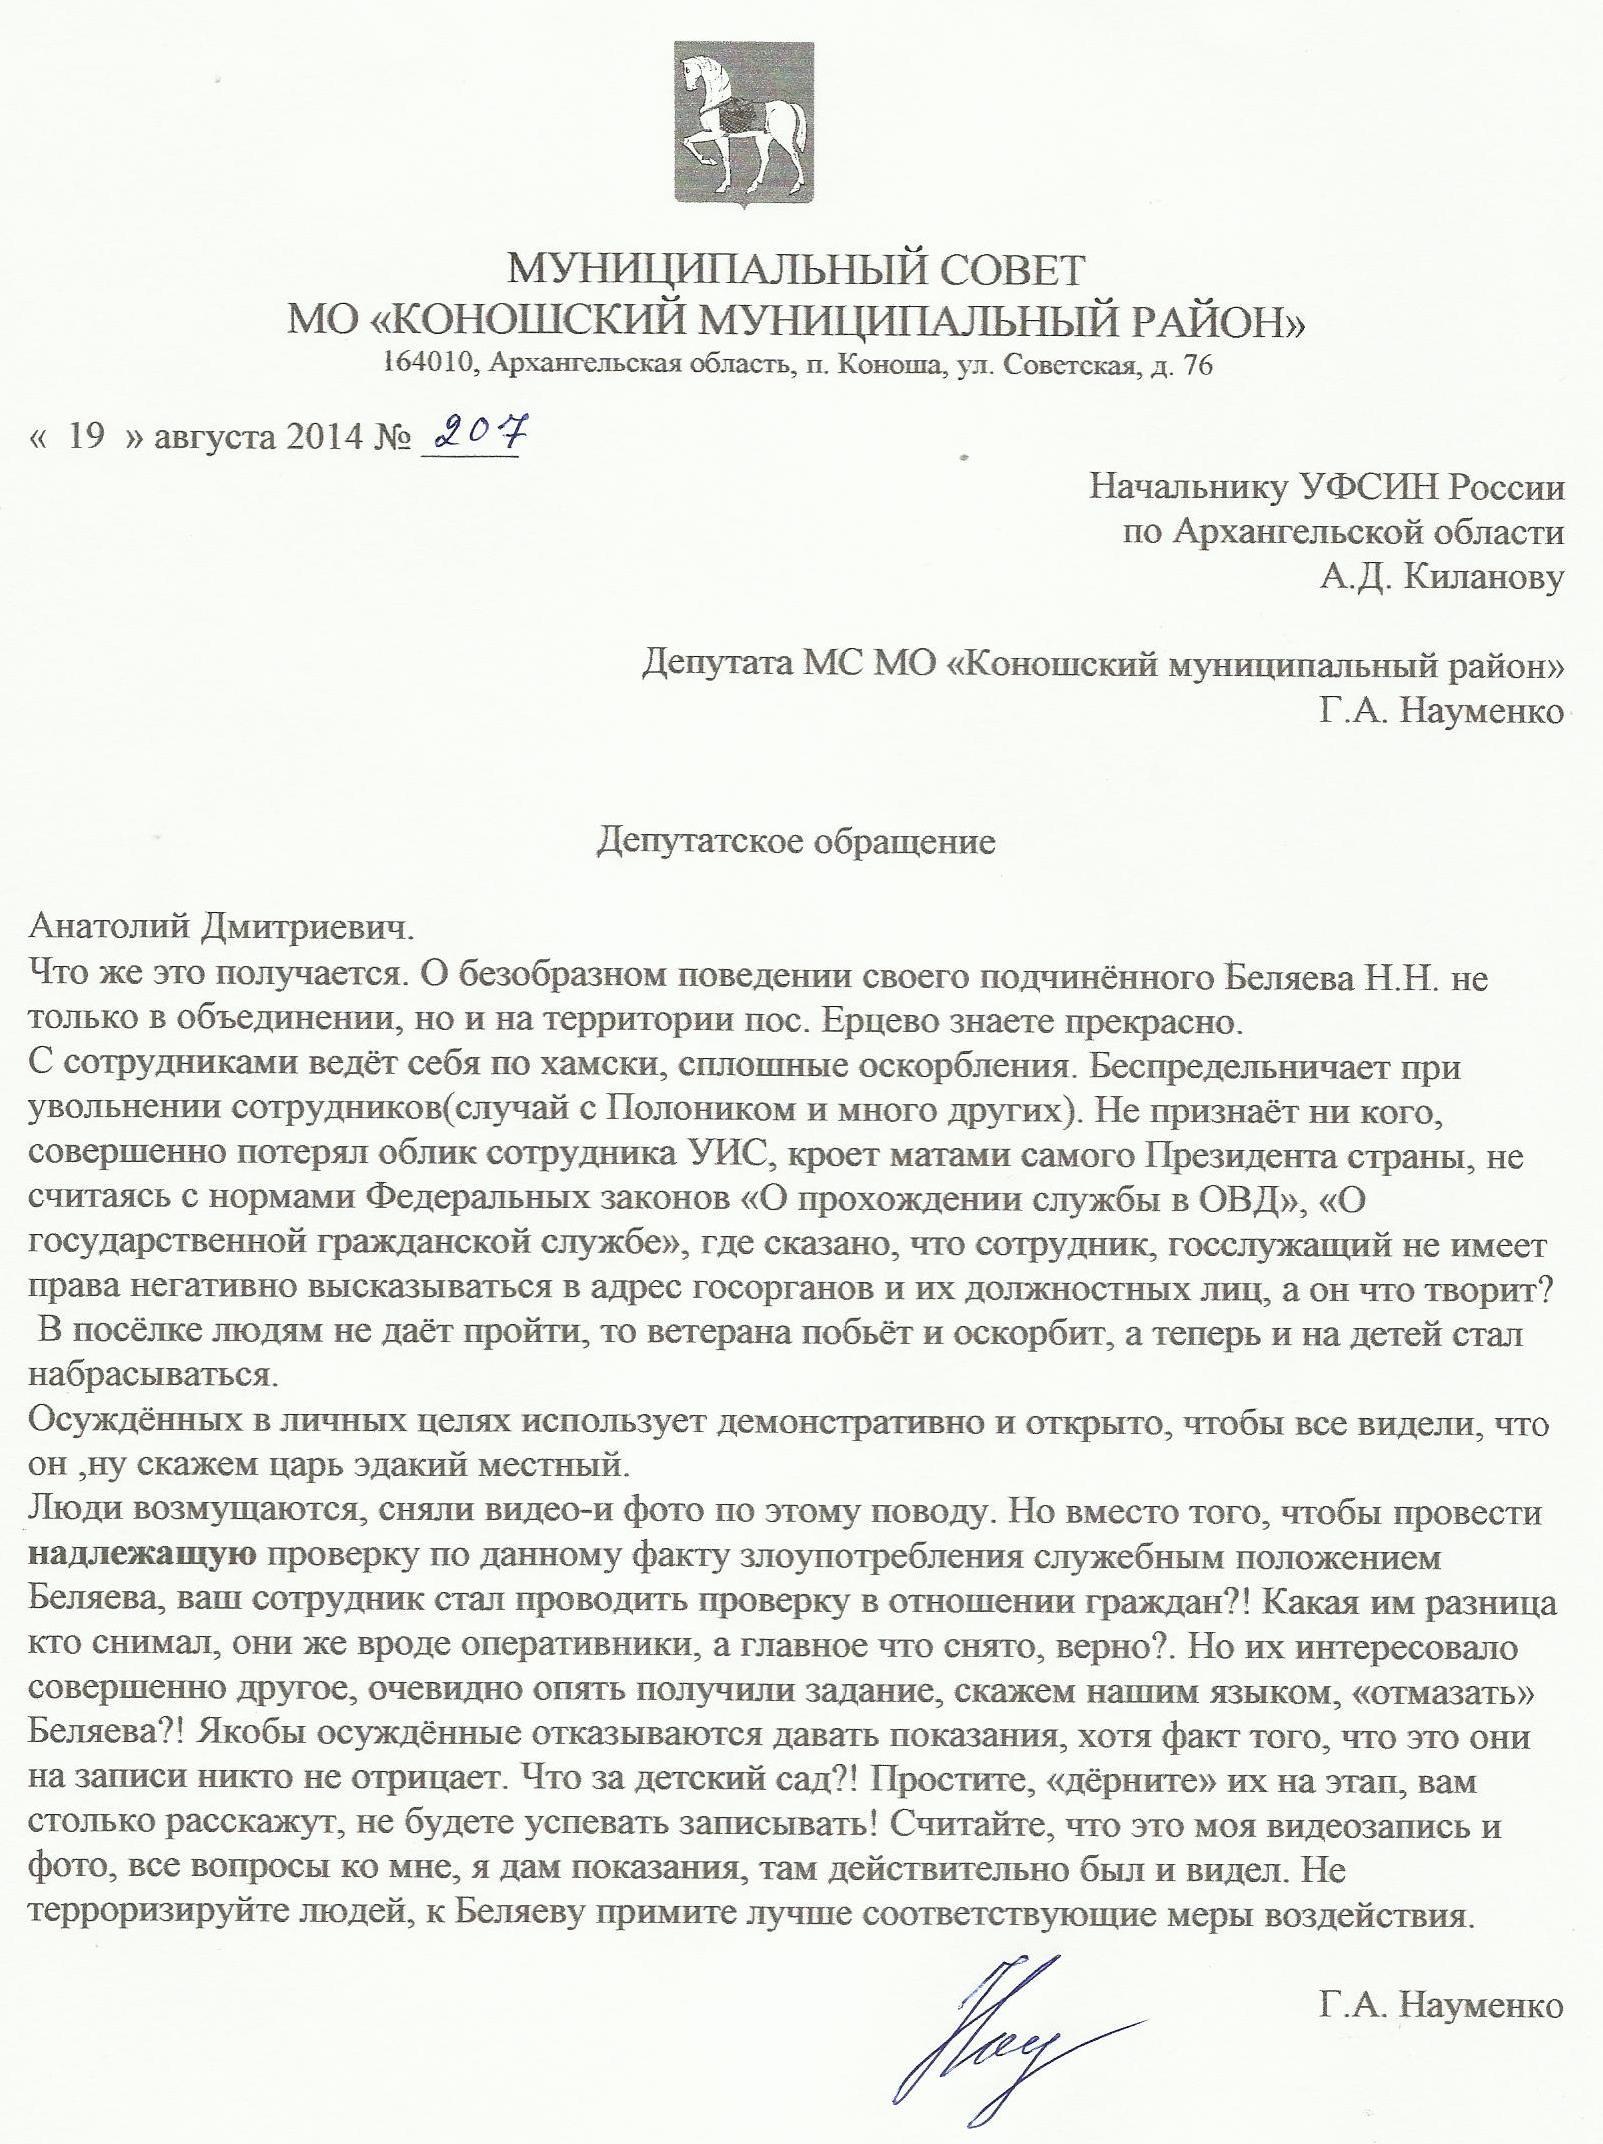 Киланову по Бяше-19.08.2014